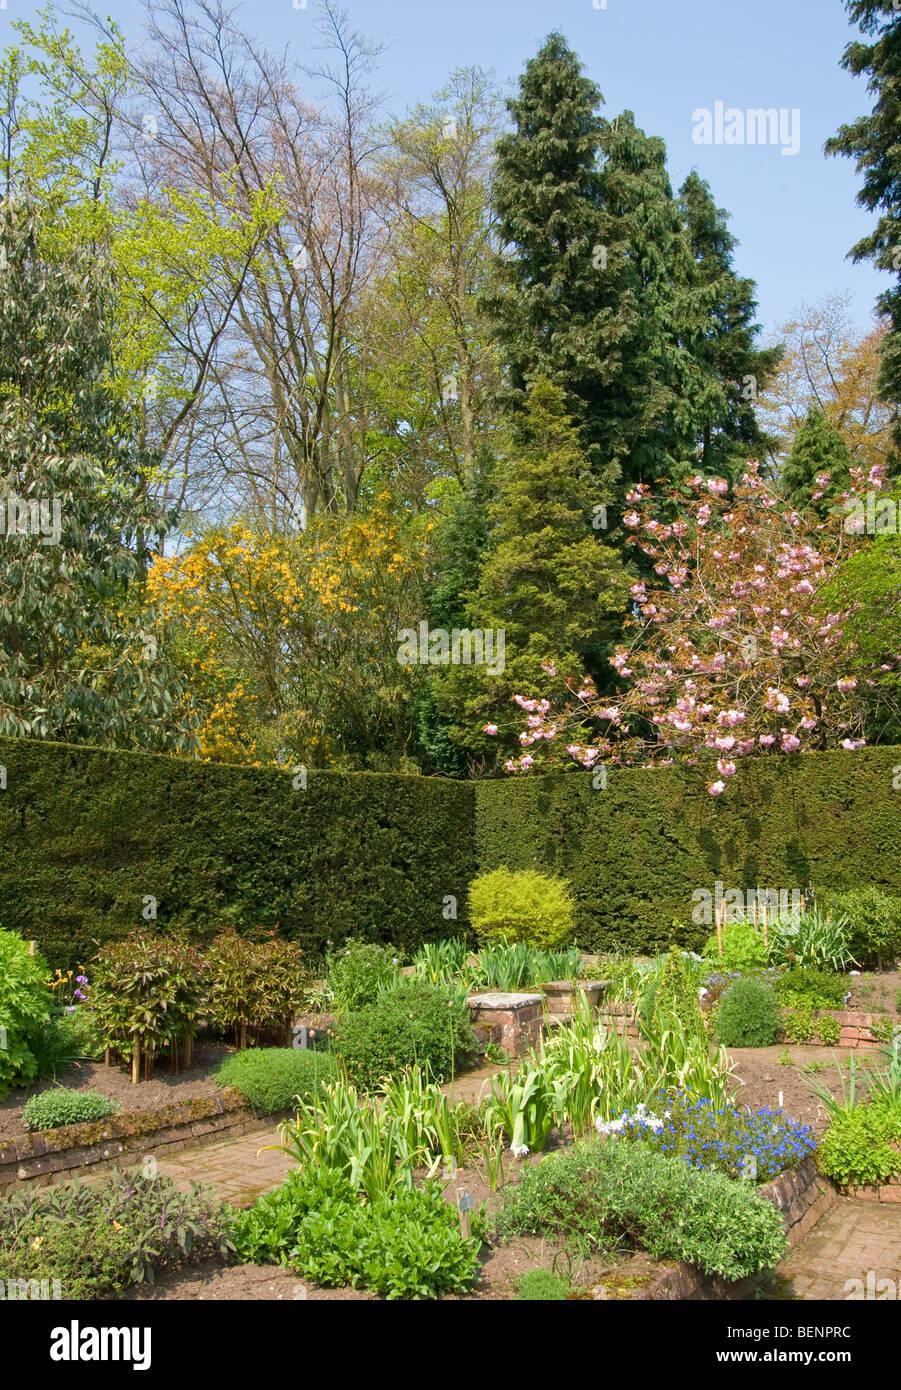 formal garden brick paths cherry blossom paeonies alliums lithodora [Newby Hall] Ripon [North Yorkshire] - Stock Image